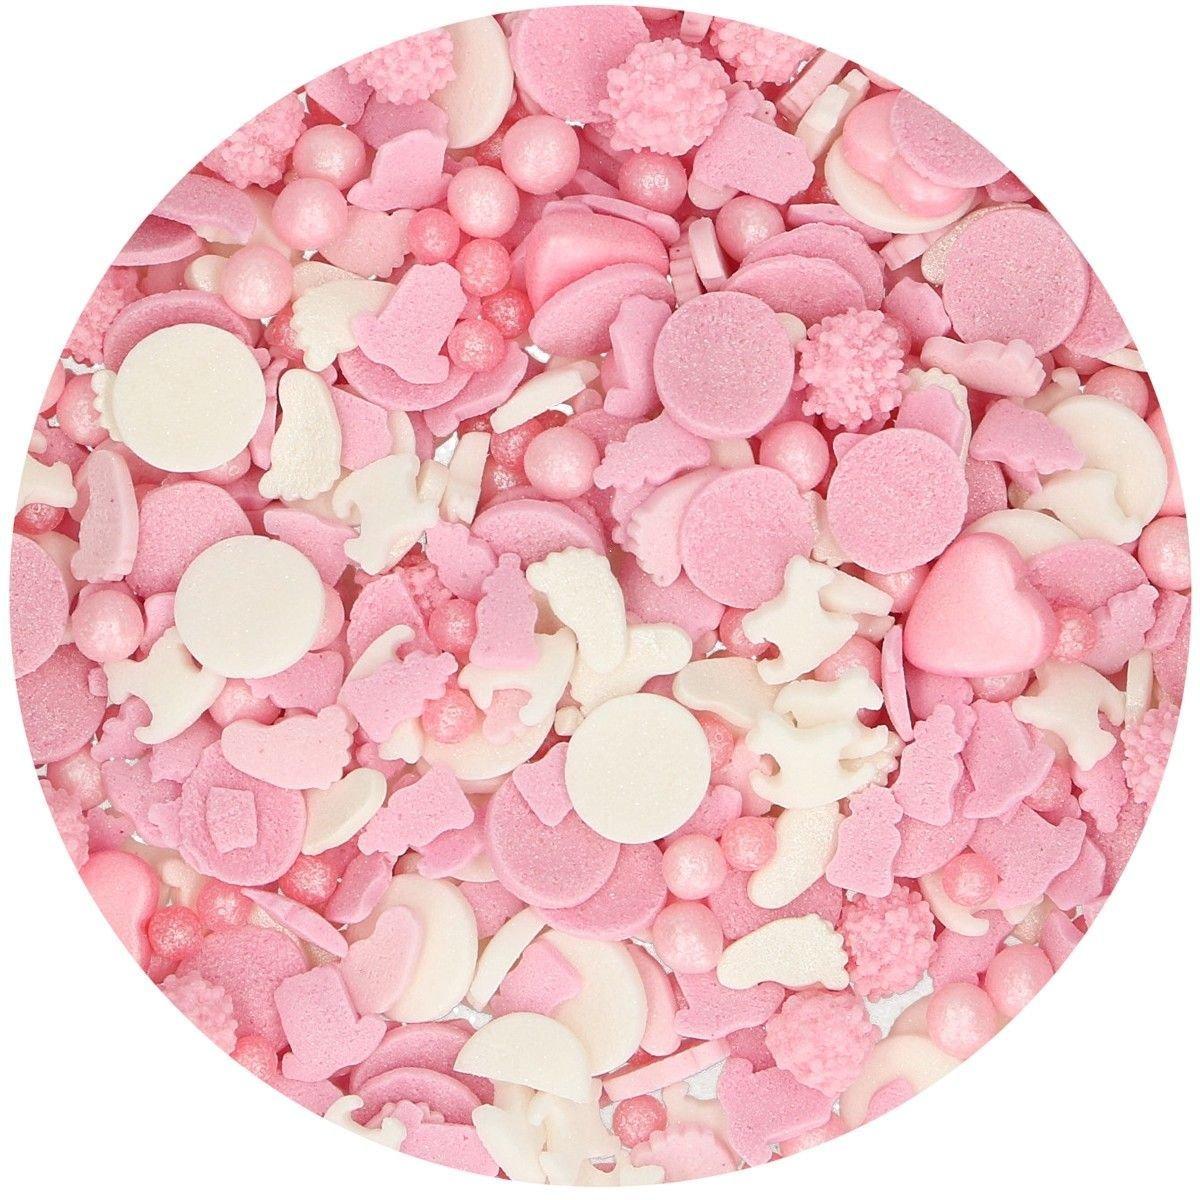 FunCakes Sprinkle Mix 180γρ -BABY GIRL MEDLEY - Ποτ Πουρί Ζαχαρωτών - Μωράκι Κορίτσι - Ροζ & Λευκό